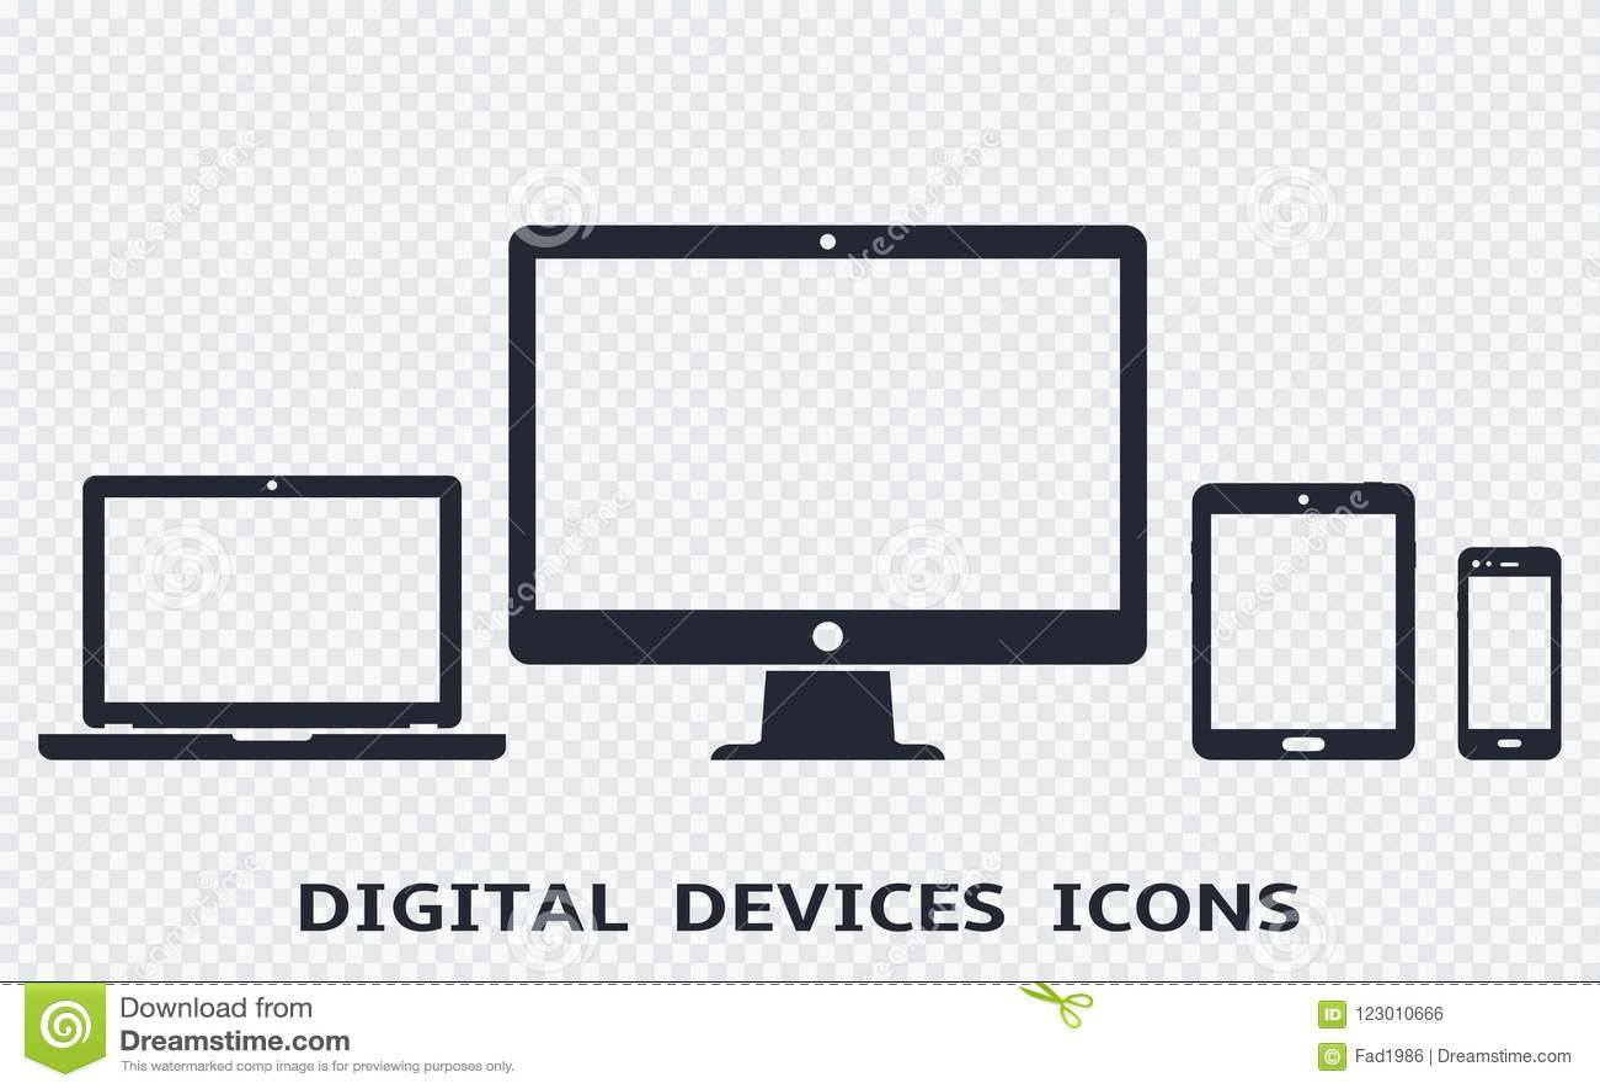 Device icons set: smartphone, tablet, laptop and desktop computer. Vector illustration of responsive web design.